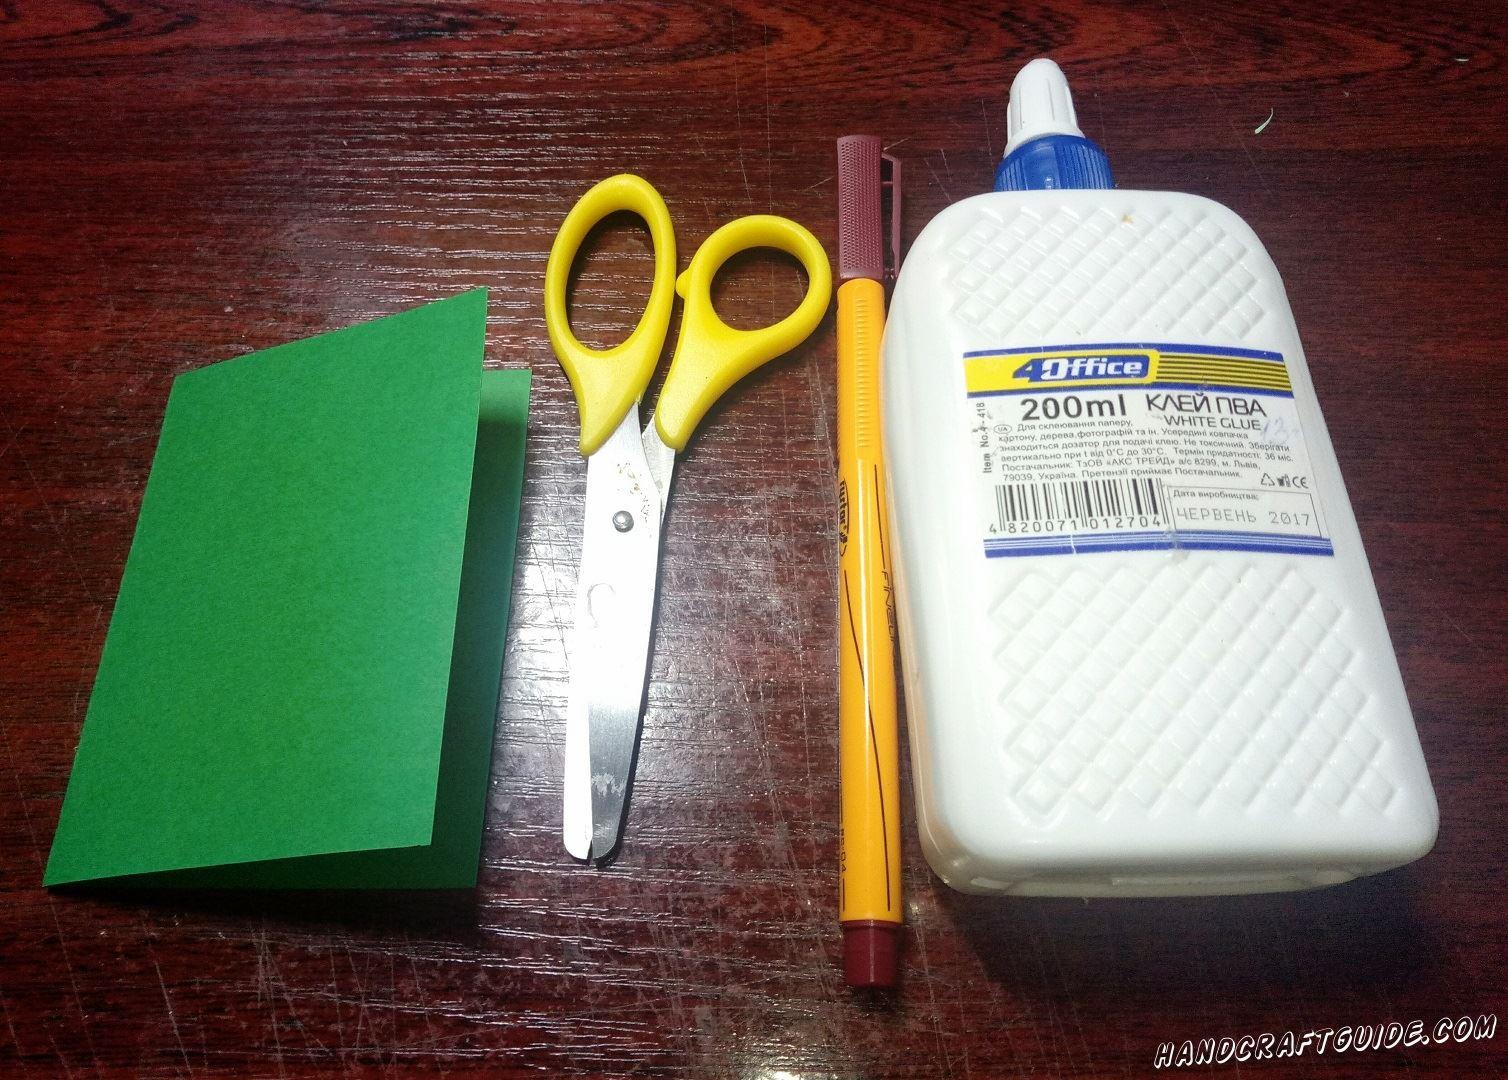 Зелёный лист бумаги мы складываем пополам